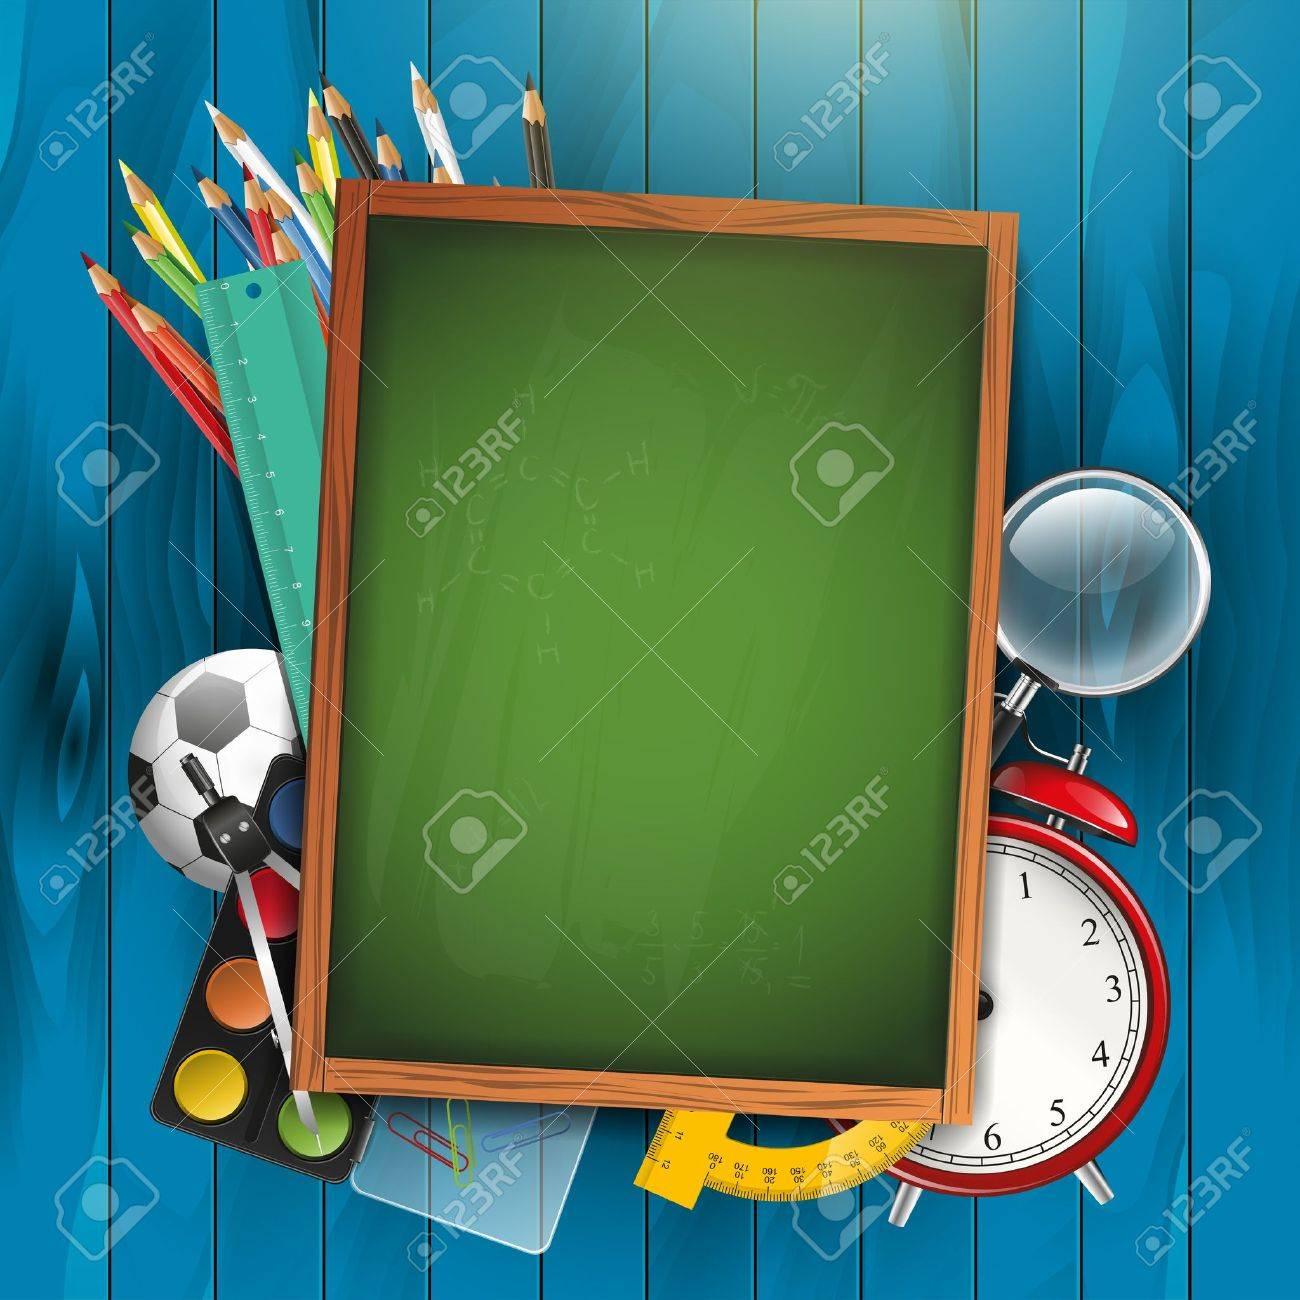 Empty cartoon classroom background - Education Background School Supplies And Empty Green Chalkboard